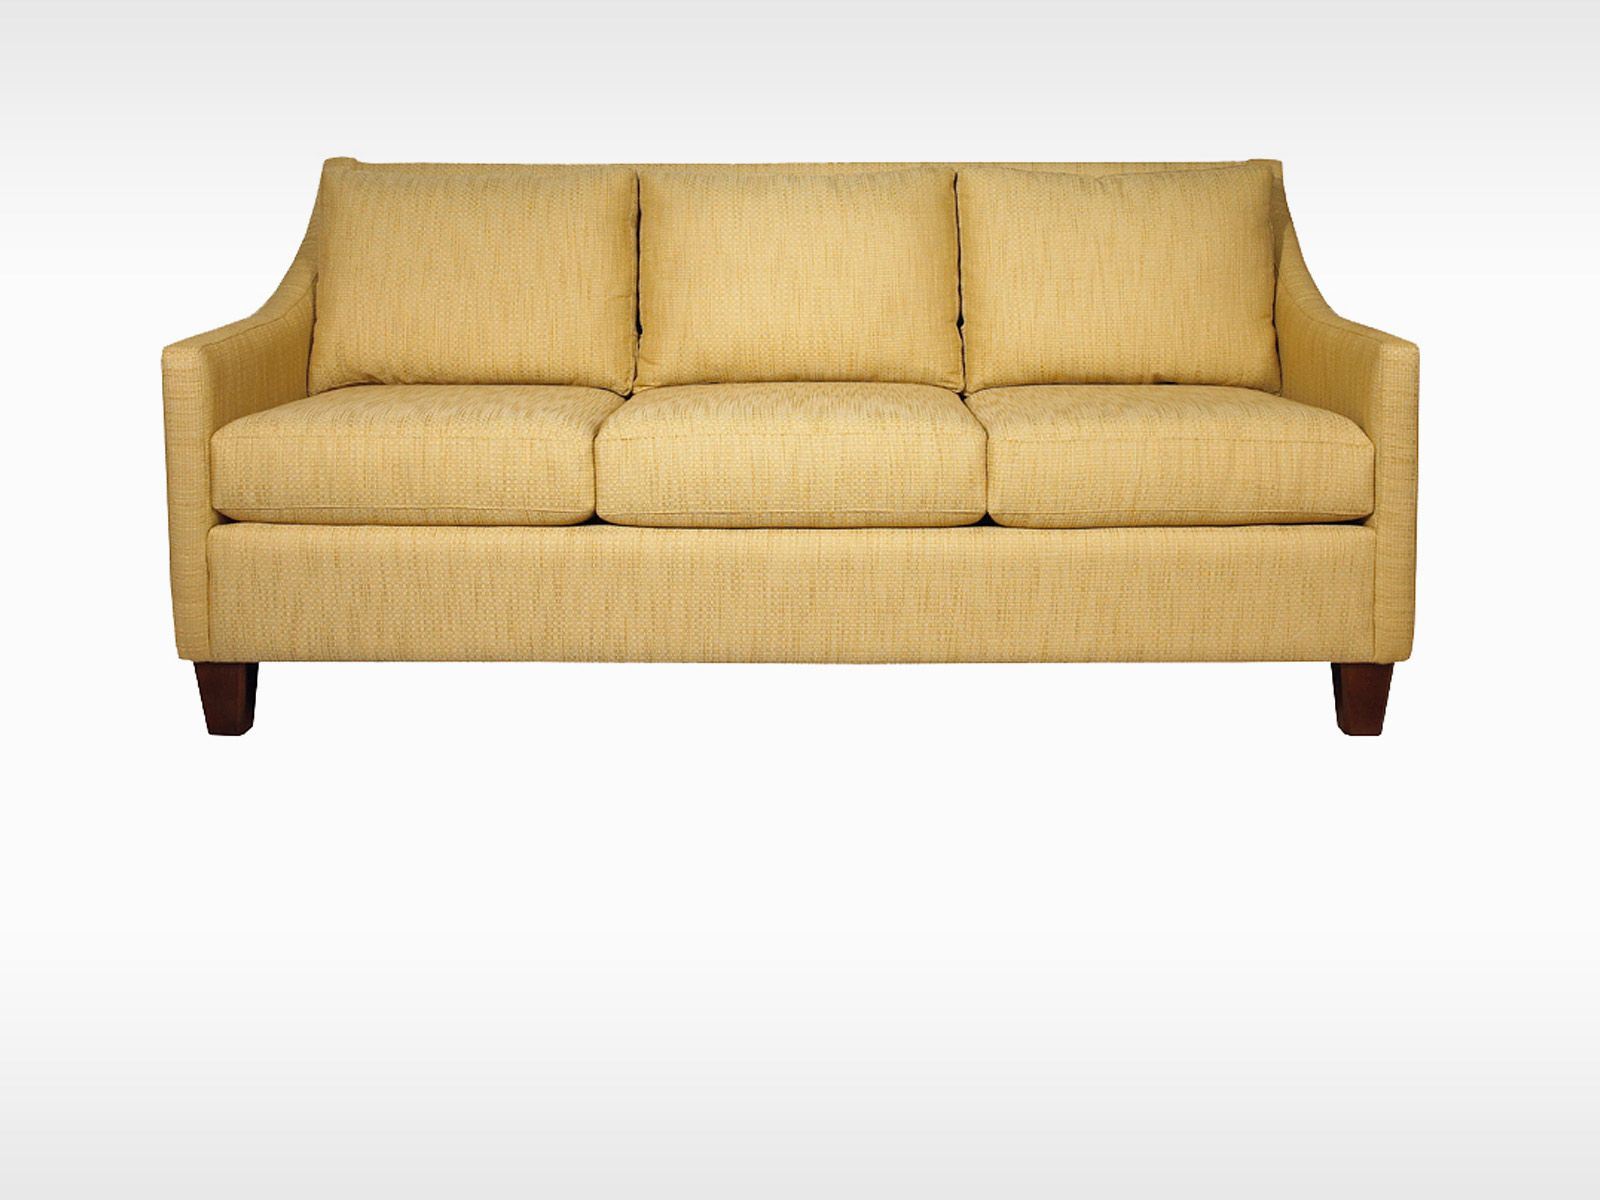 Brentwood Classics 'Clemence' sofa - $1800